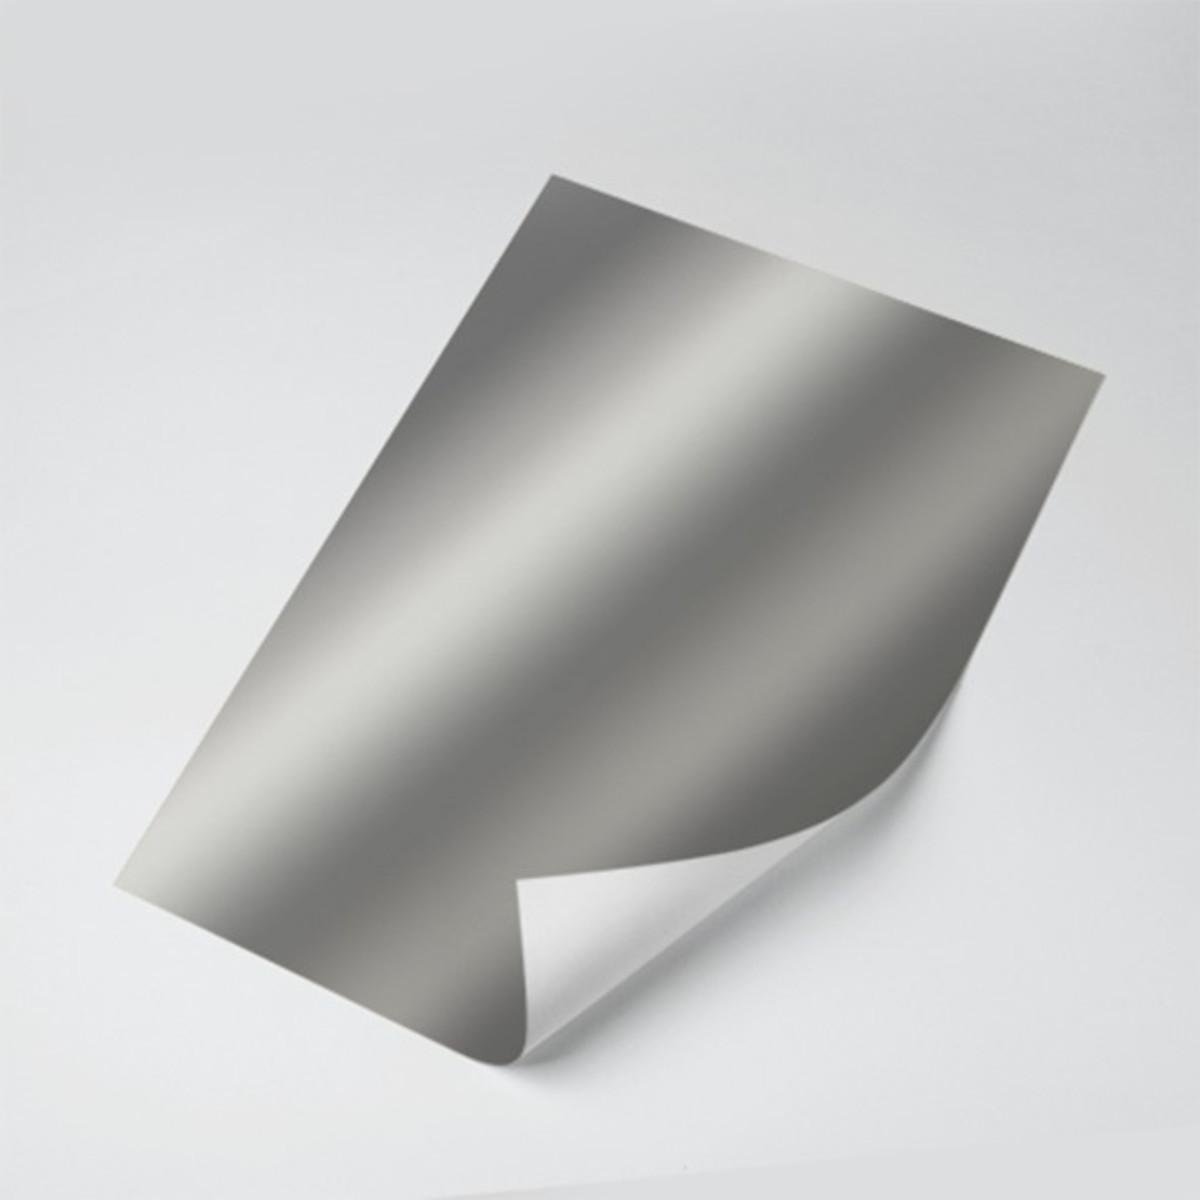 Papel Laminado Prata 250g - c/10 fls Tamanho - 21,0 x 29,7